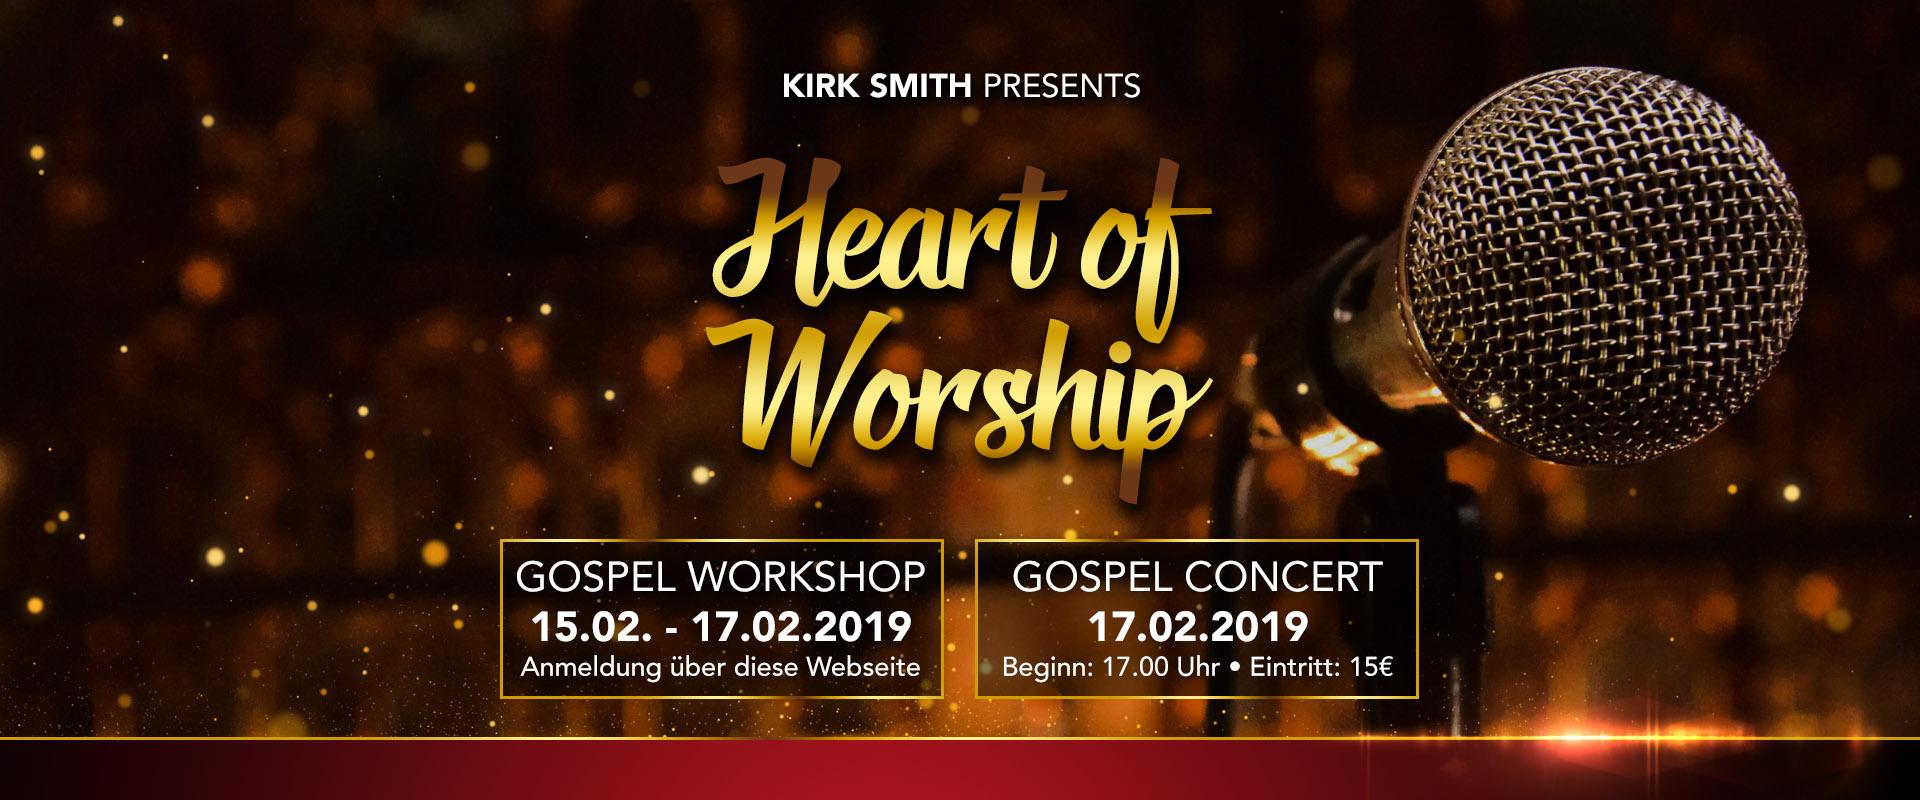 heart-of-worship-gospel-workshop-concert-slider-1920x800-2019-1-neu-bg